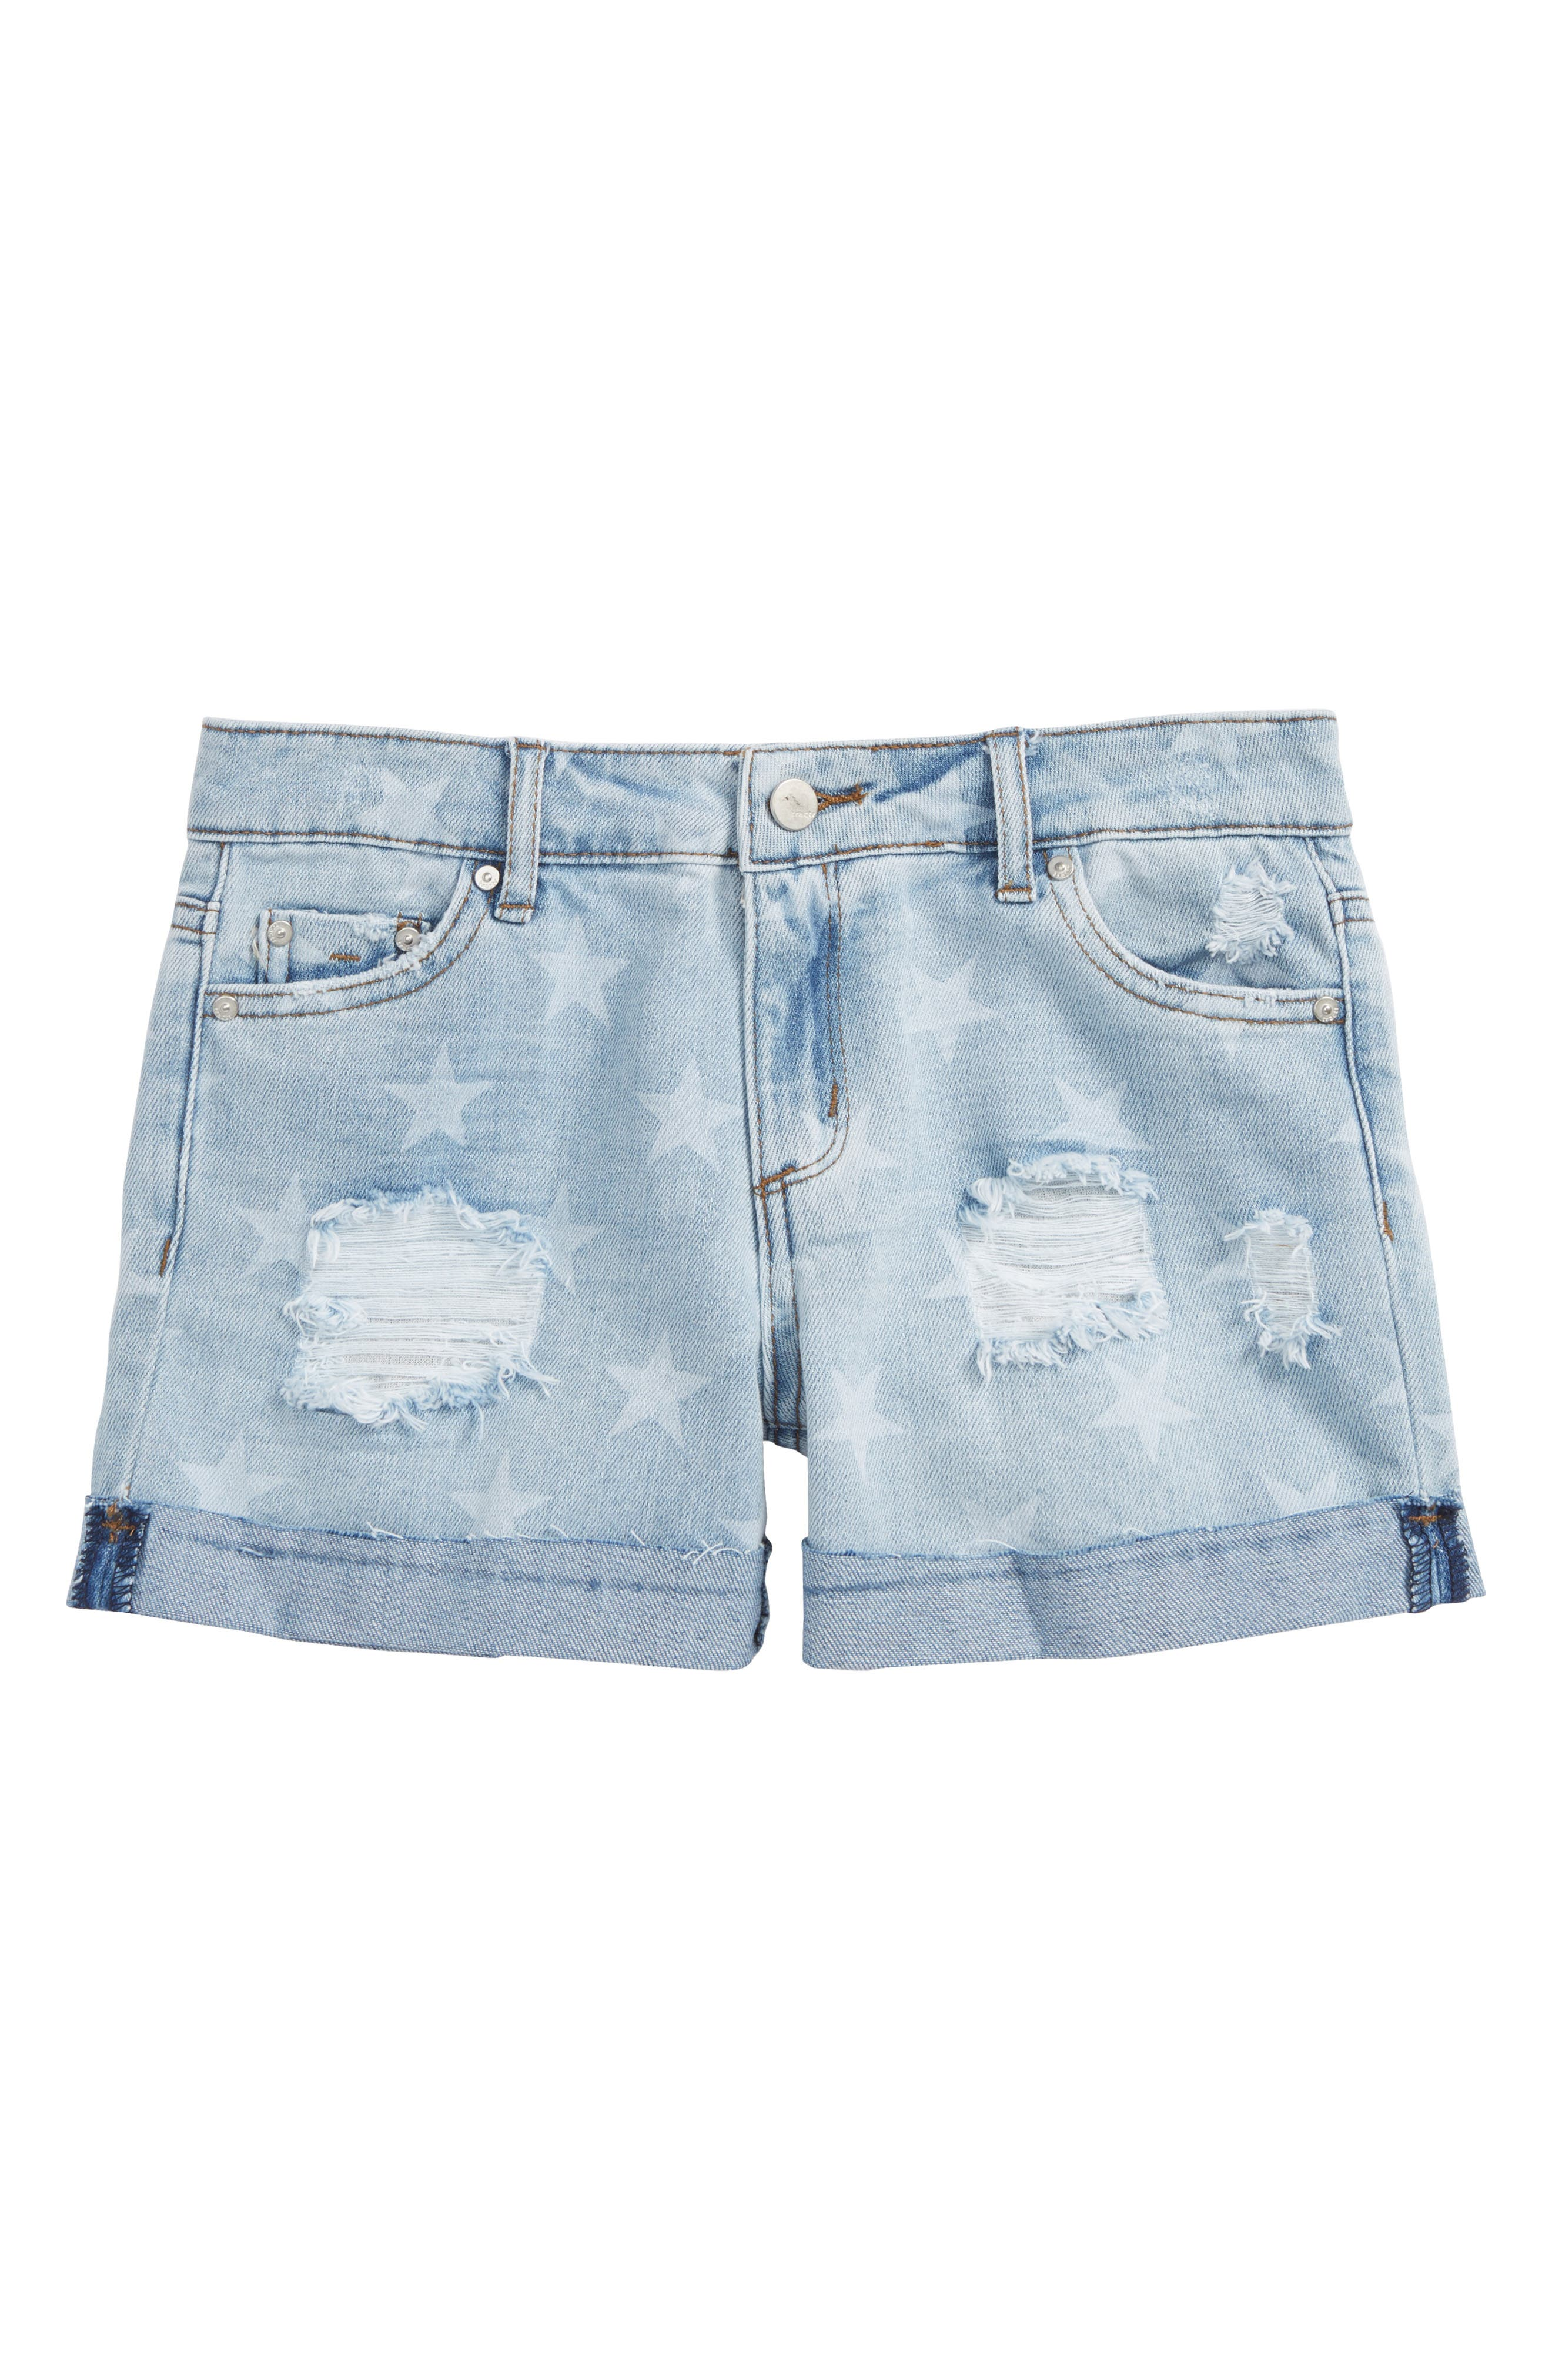 Star Roll Distressed Denim Shorts,                         Main,                         color, Light Indigo